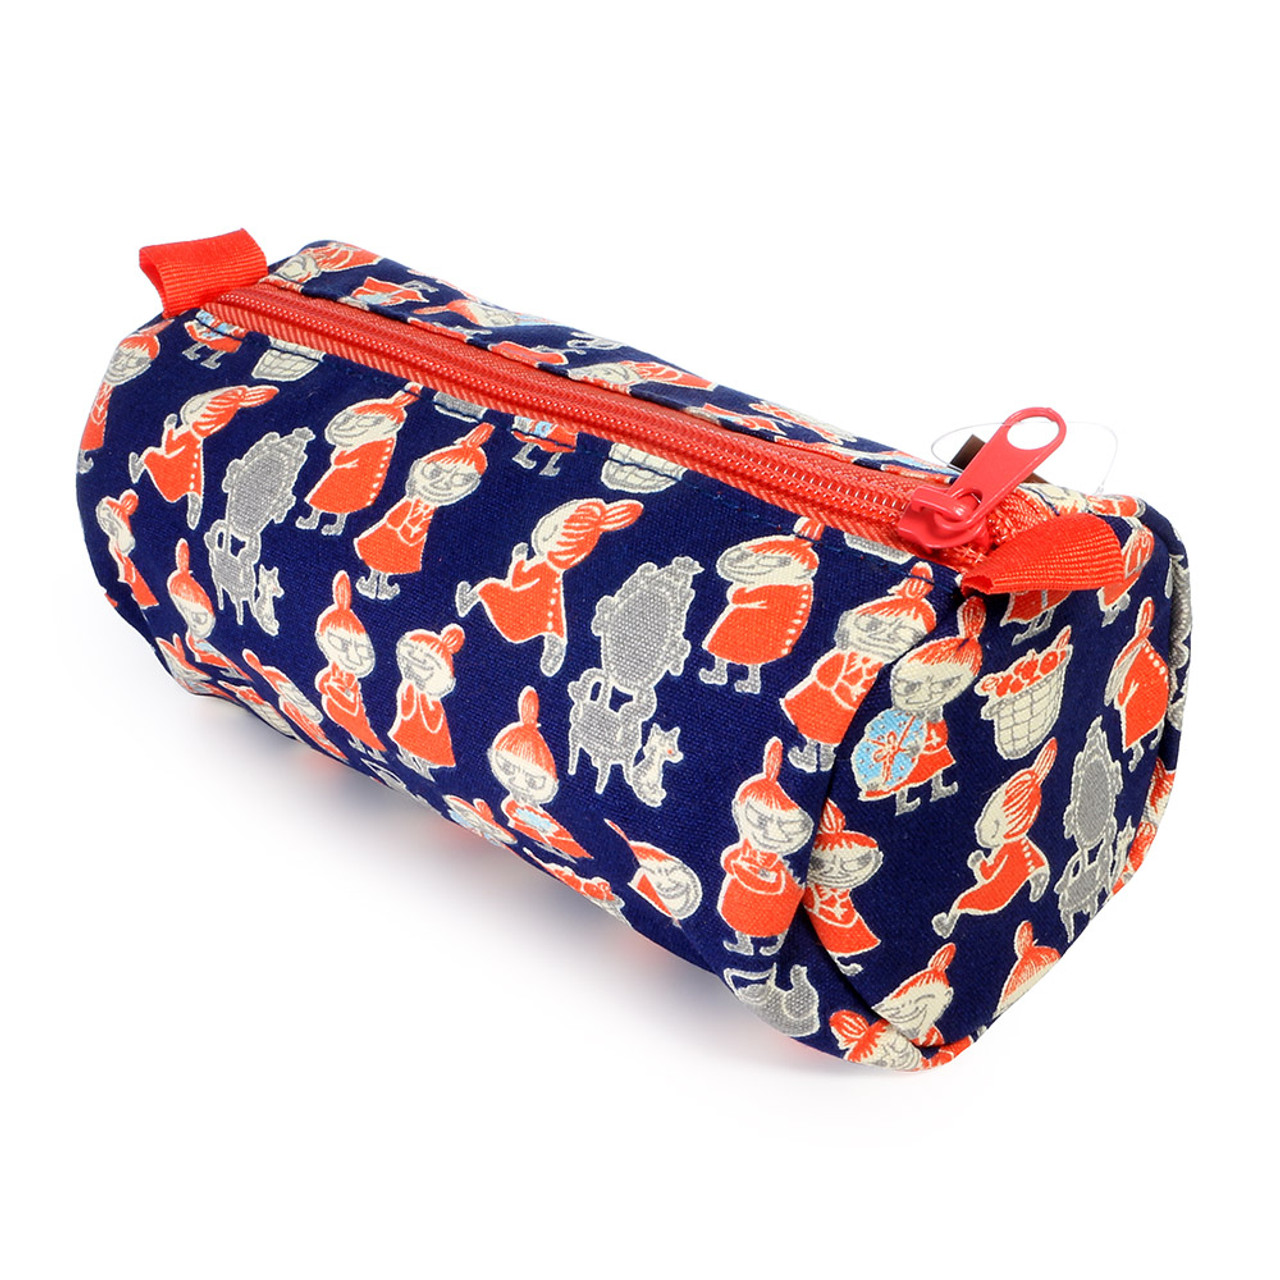 Moomin Canvas Barrel Pencil Case - Navy Blue ( Side View )